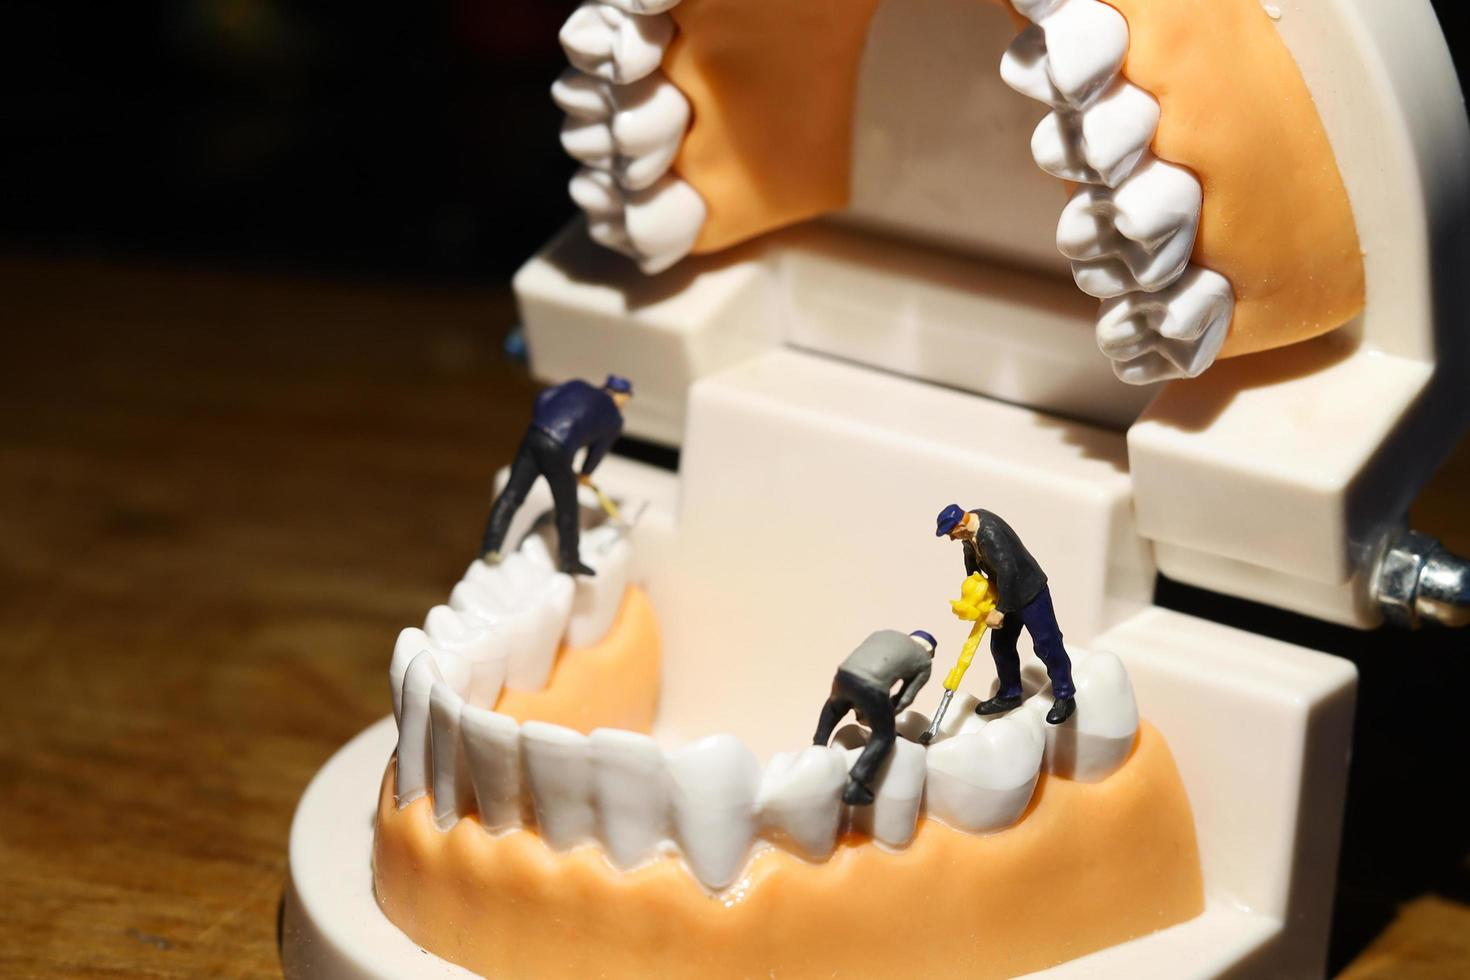 Miniaturfiguren bohren Zähne foto